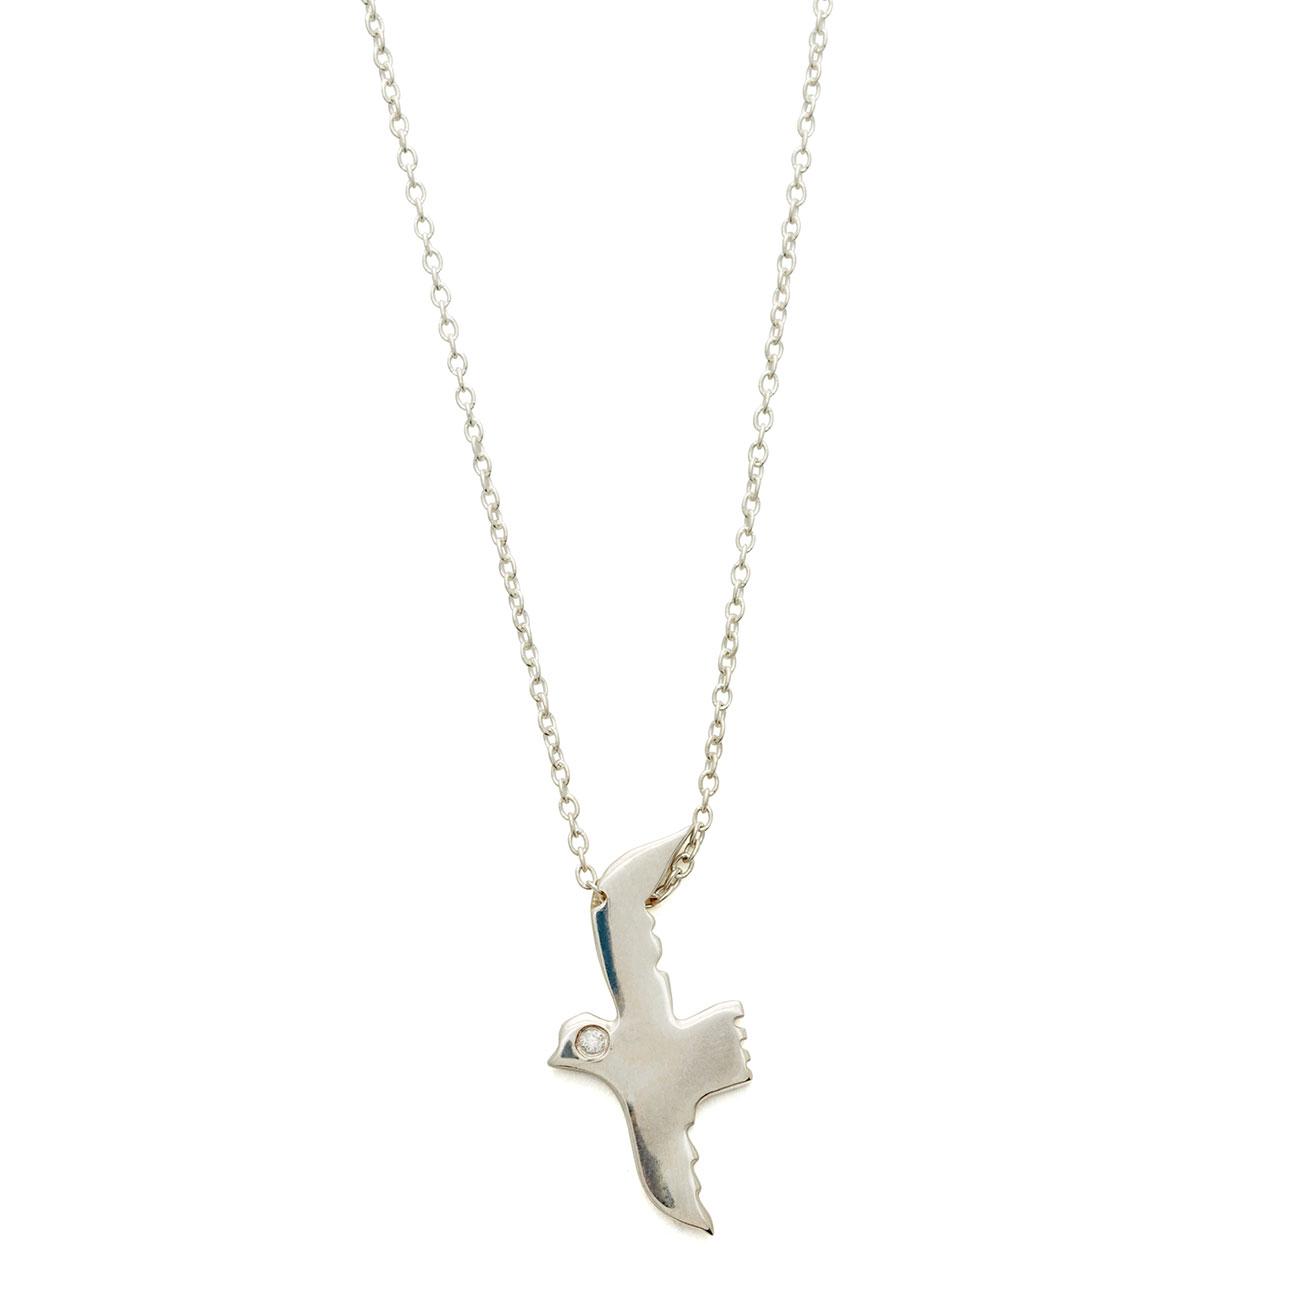 Sterling Silver Flying Bird Necklace With White Diamond Eye - Elisa Solomon